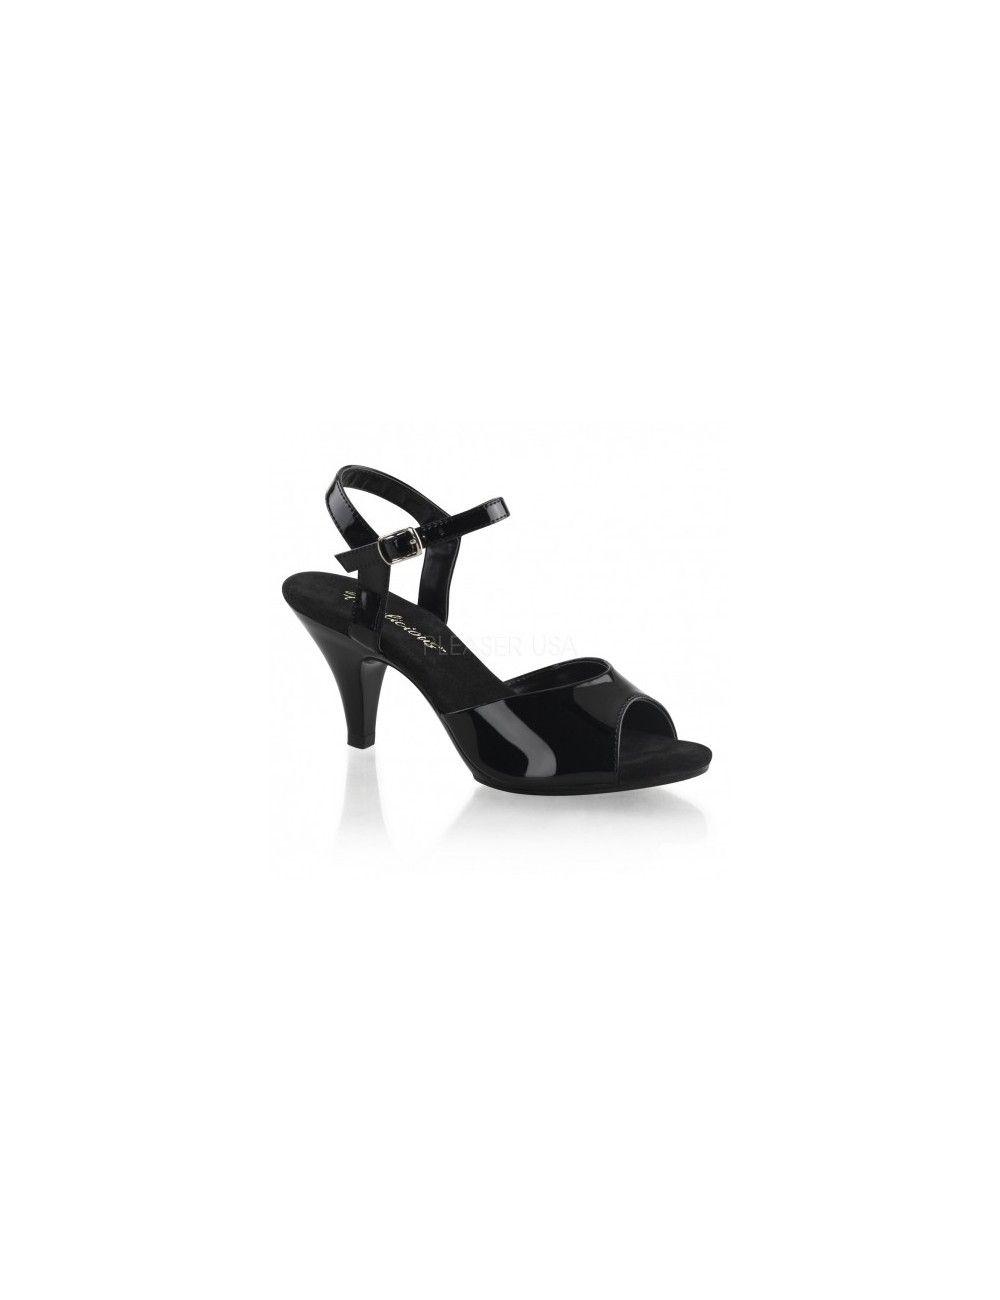 Sandales noir vernis Belle & Chic PLEASER